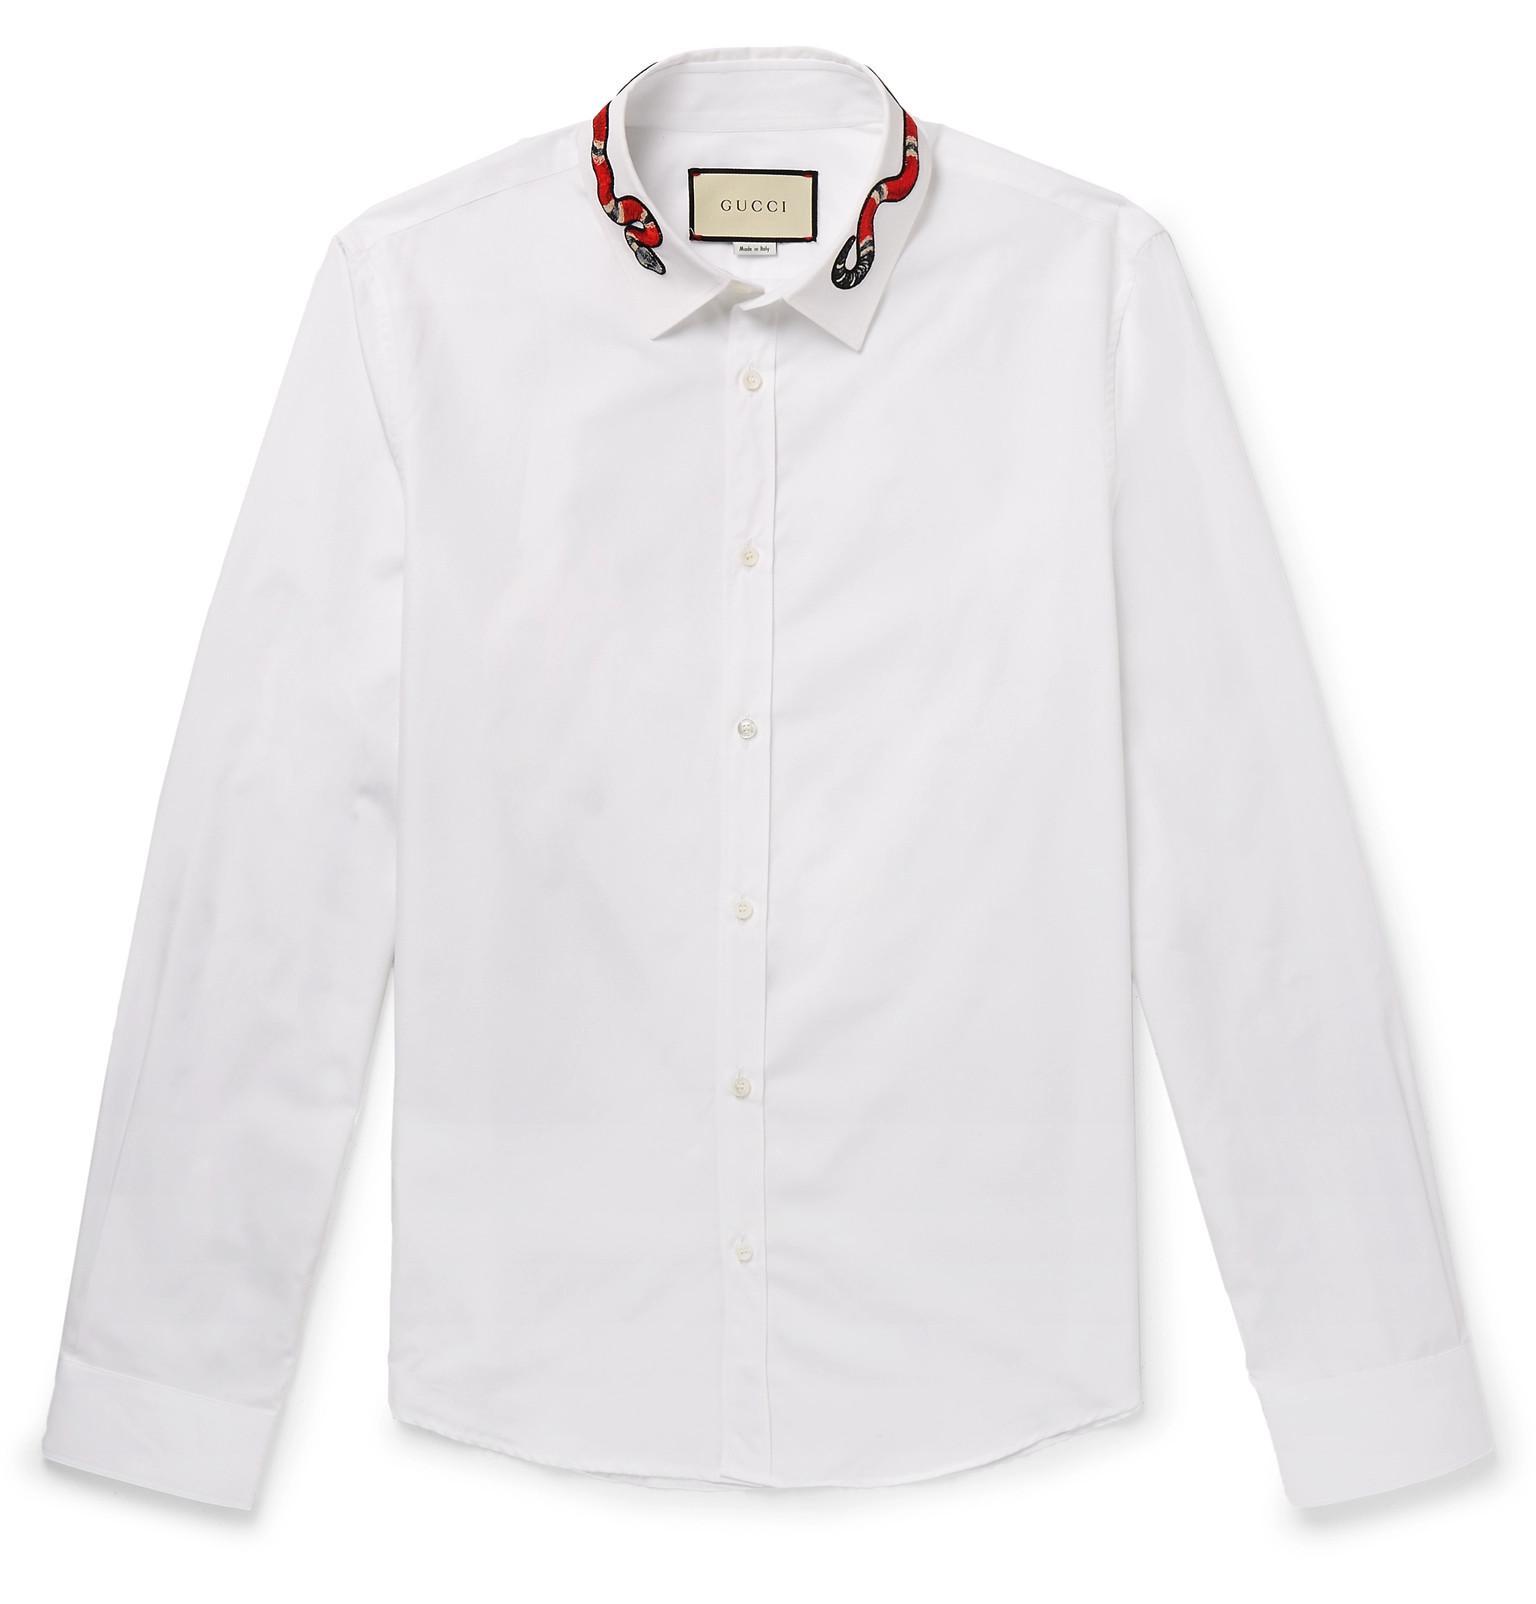 b652f379d Gucci - White Duke Appliquéd Cotton Oxford Shirt for Men - Lyst. View  fullscreen